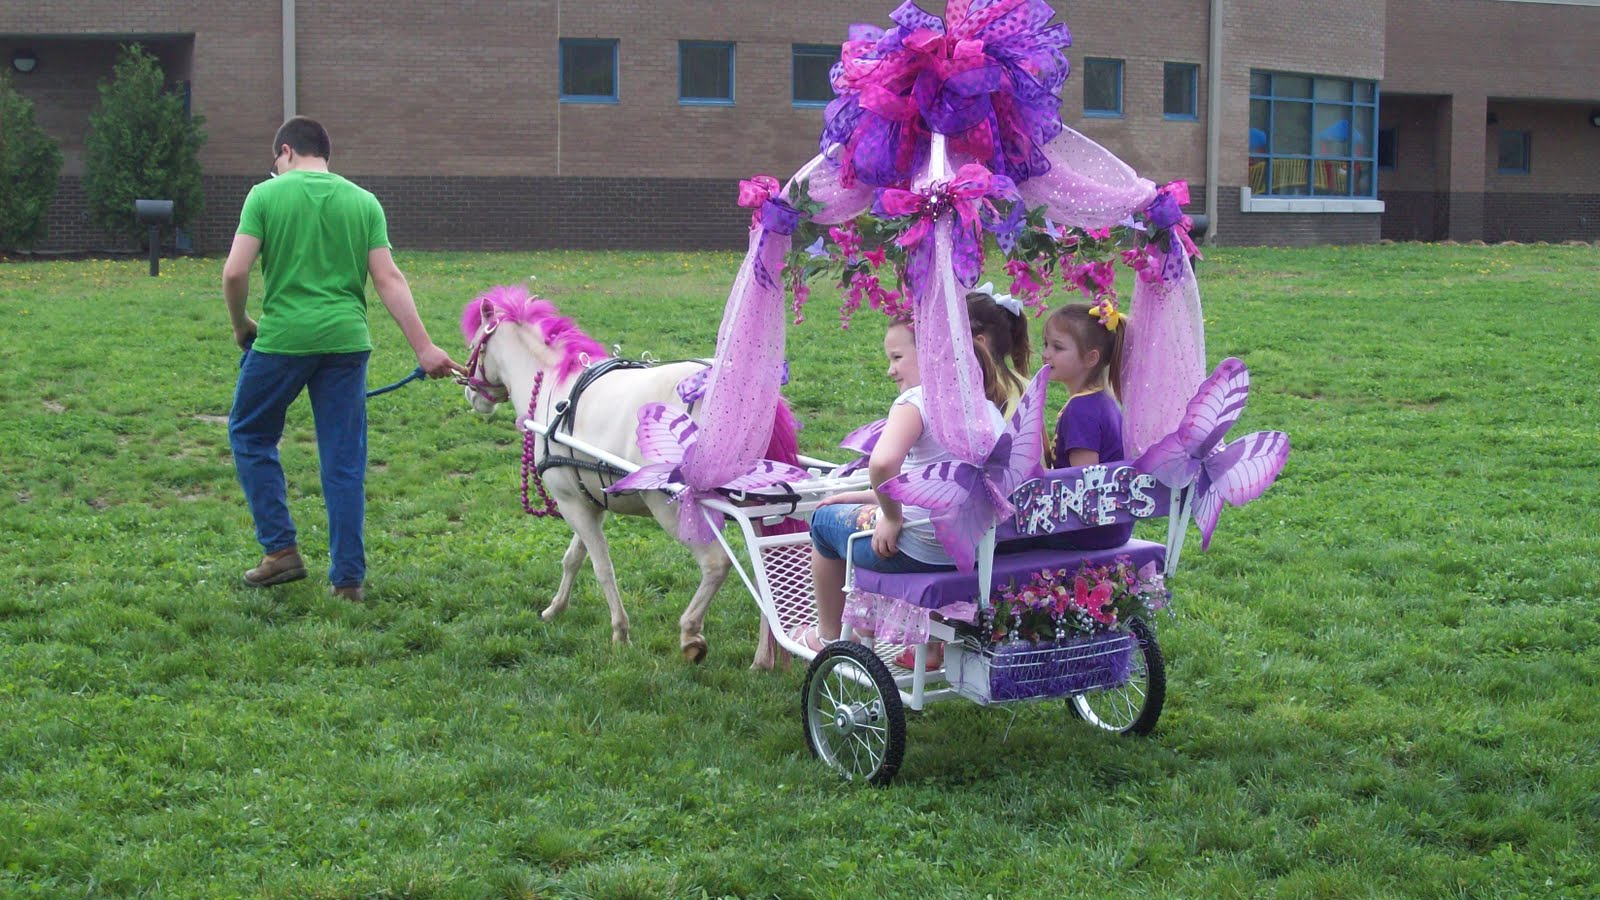 http://1.bp.blogspot.com/-c5J-gLUSgJE/TaPNq1B1LDI/AAAAAAAAACs/YTIiHA33Isg/s1600/WV2011+-+40+-+Pink+Pony.JPG